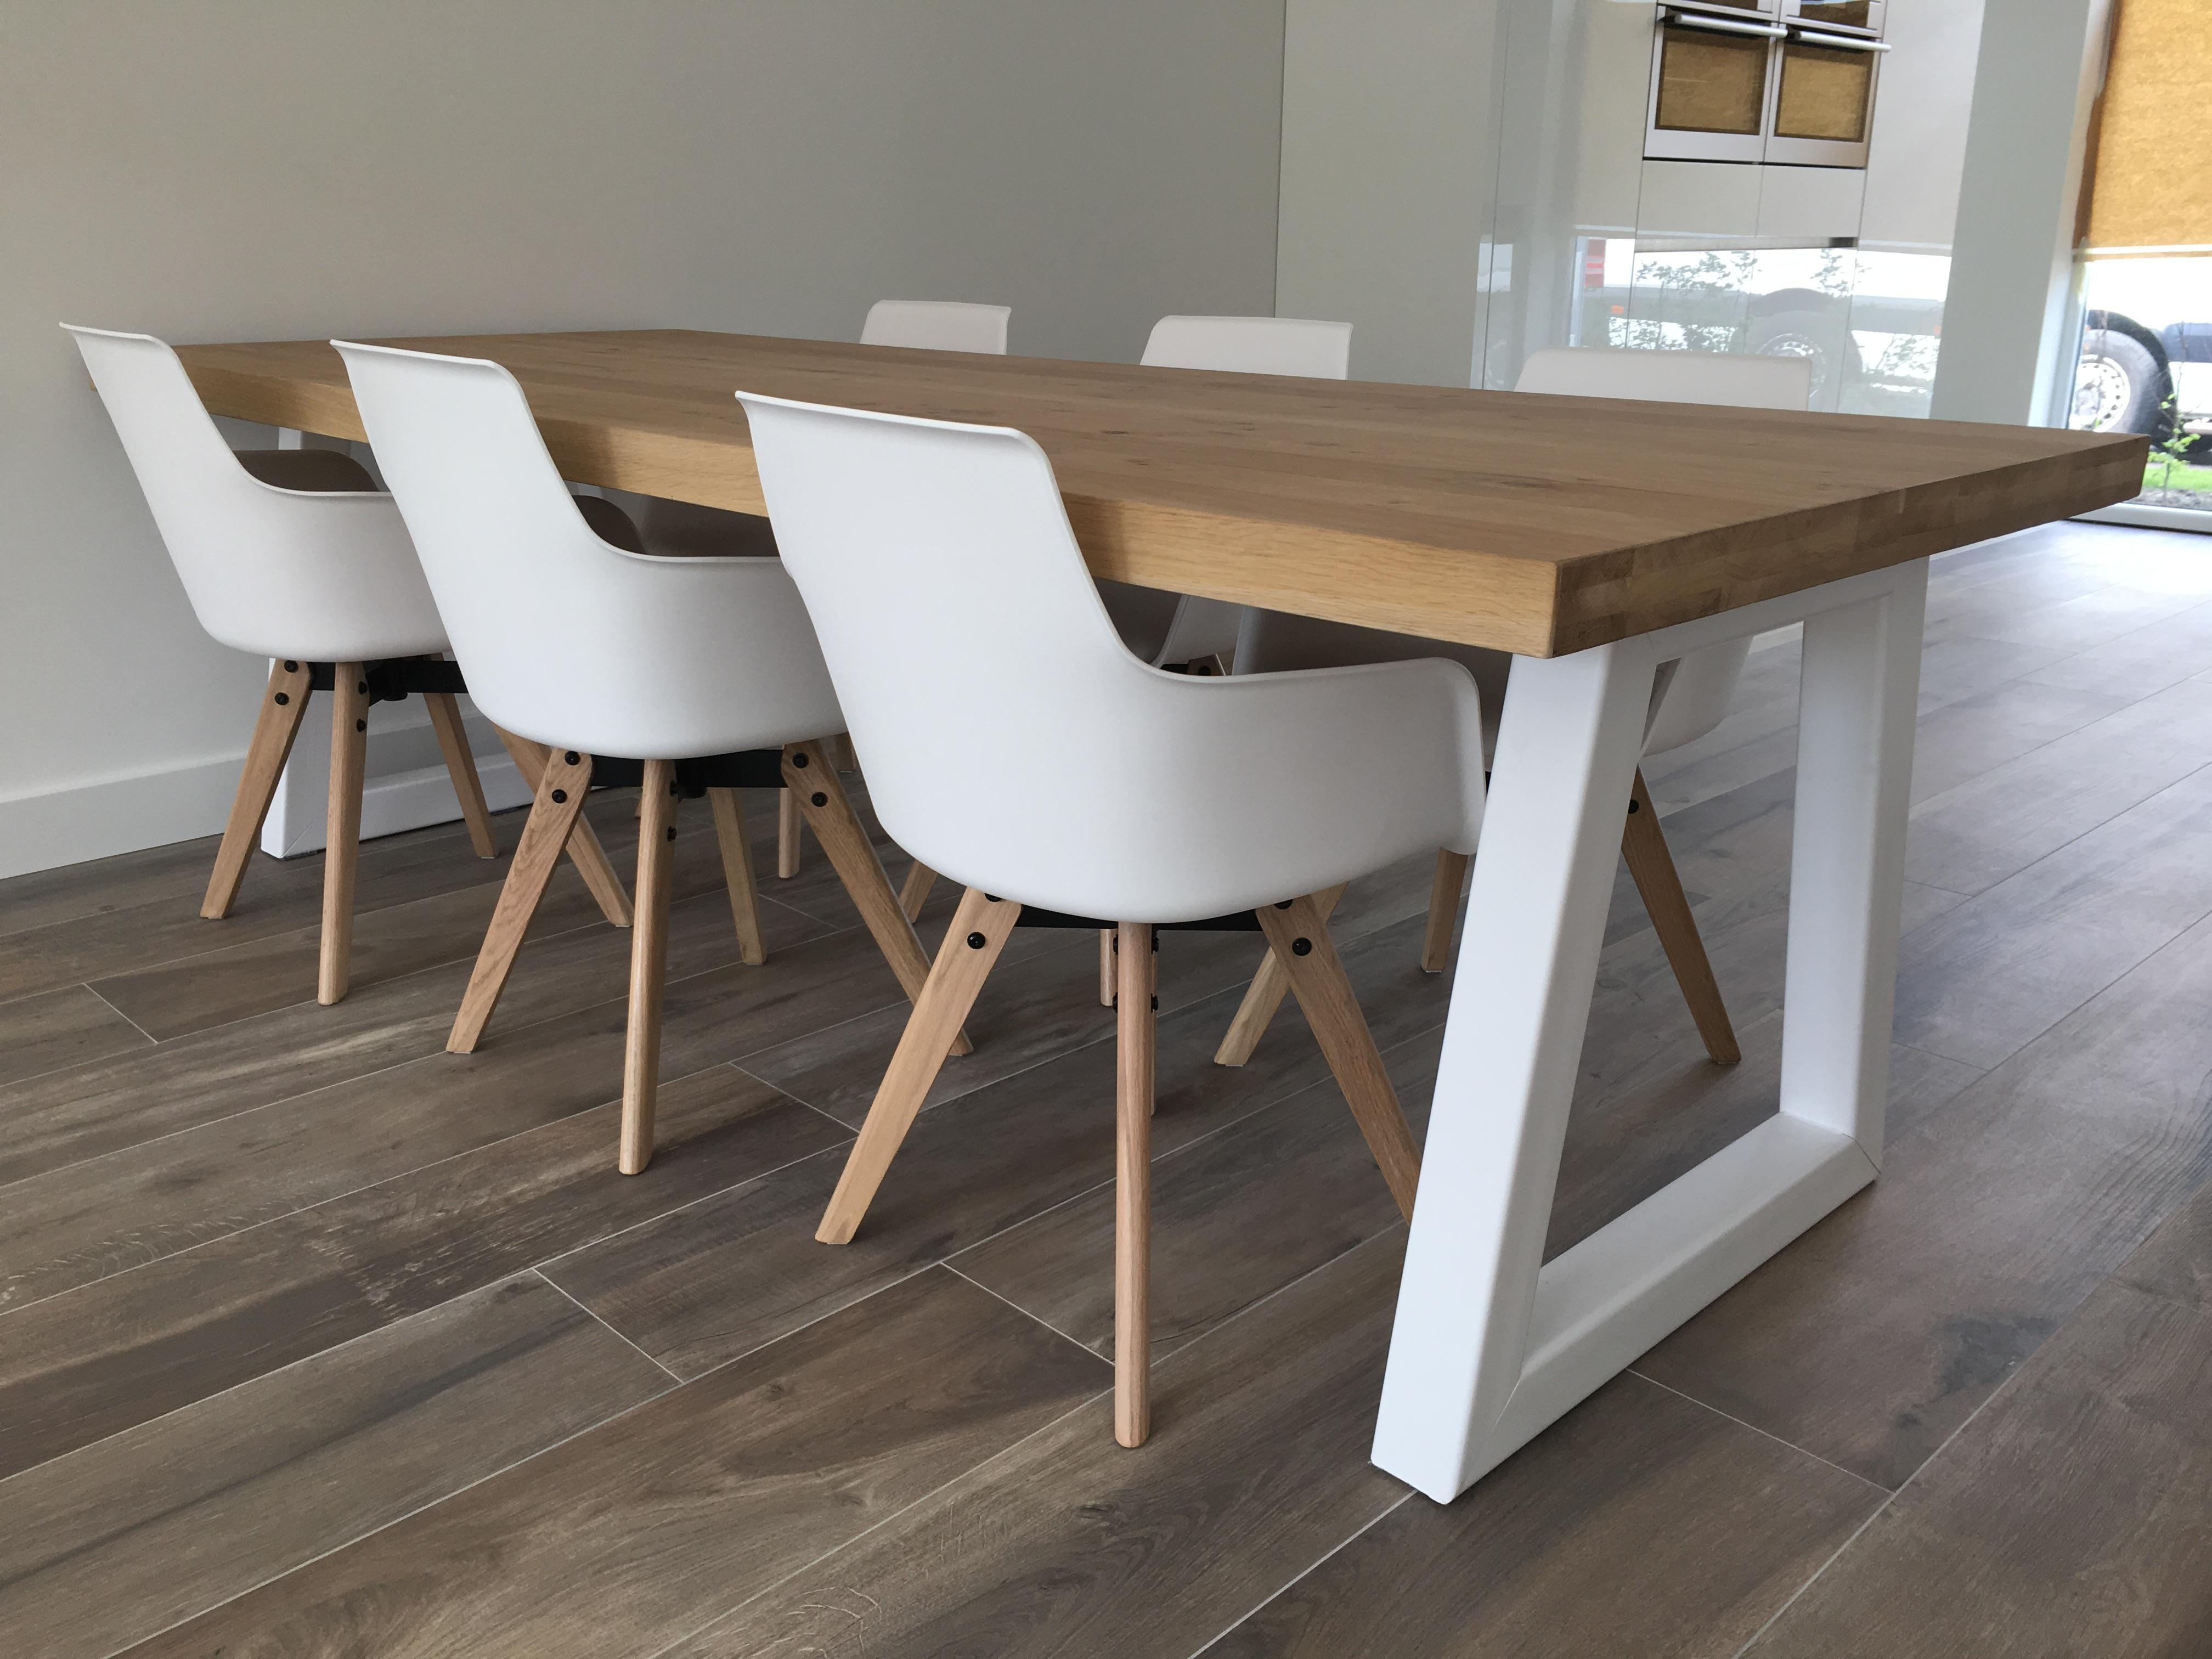 Wit Eiken Tafel : Toffe tafels strakke eettafels